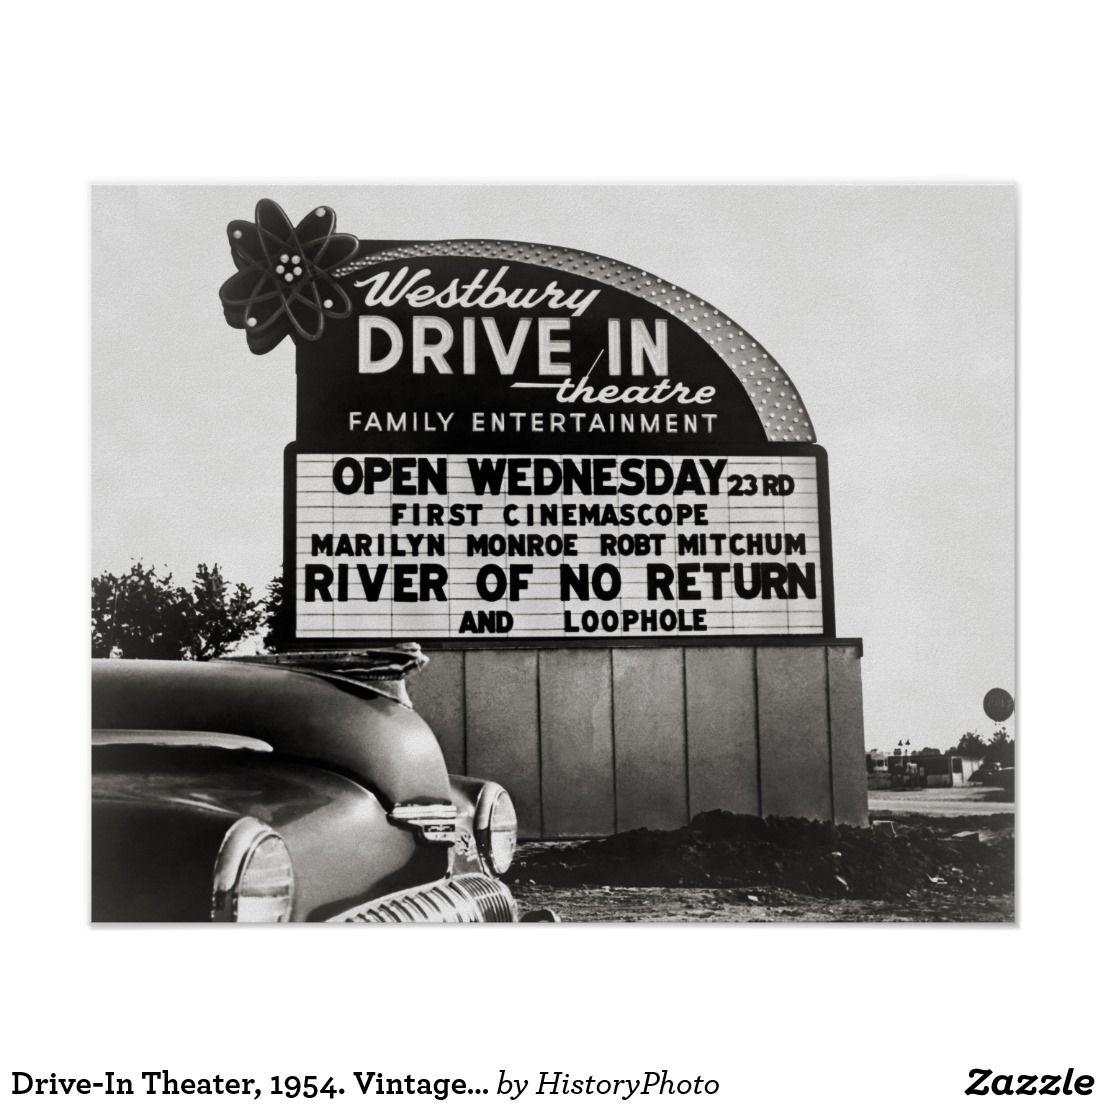 Drivein theater 1954 vintage photo poster